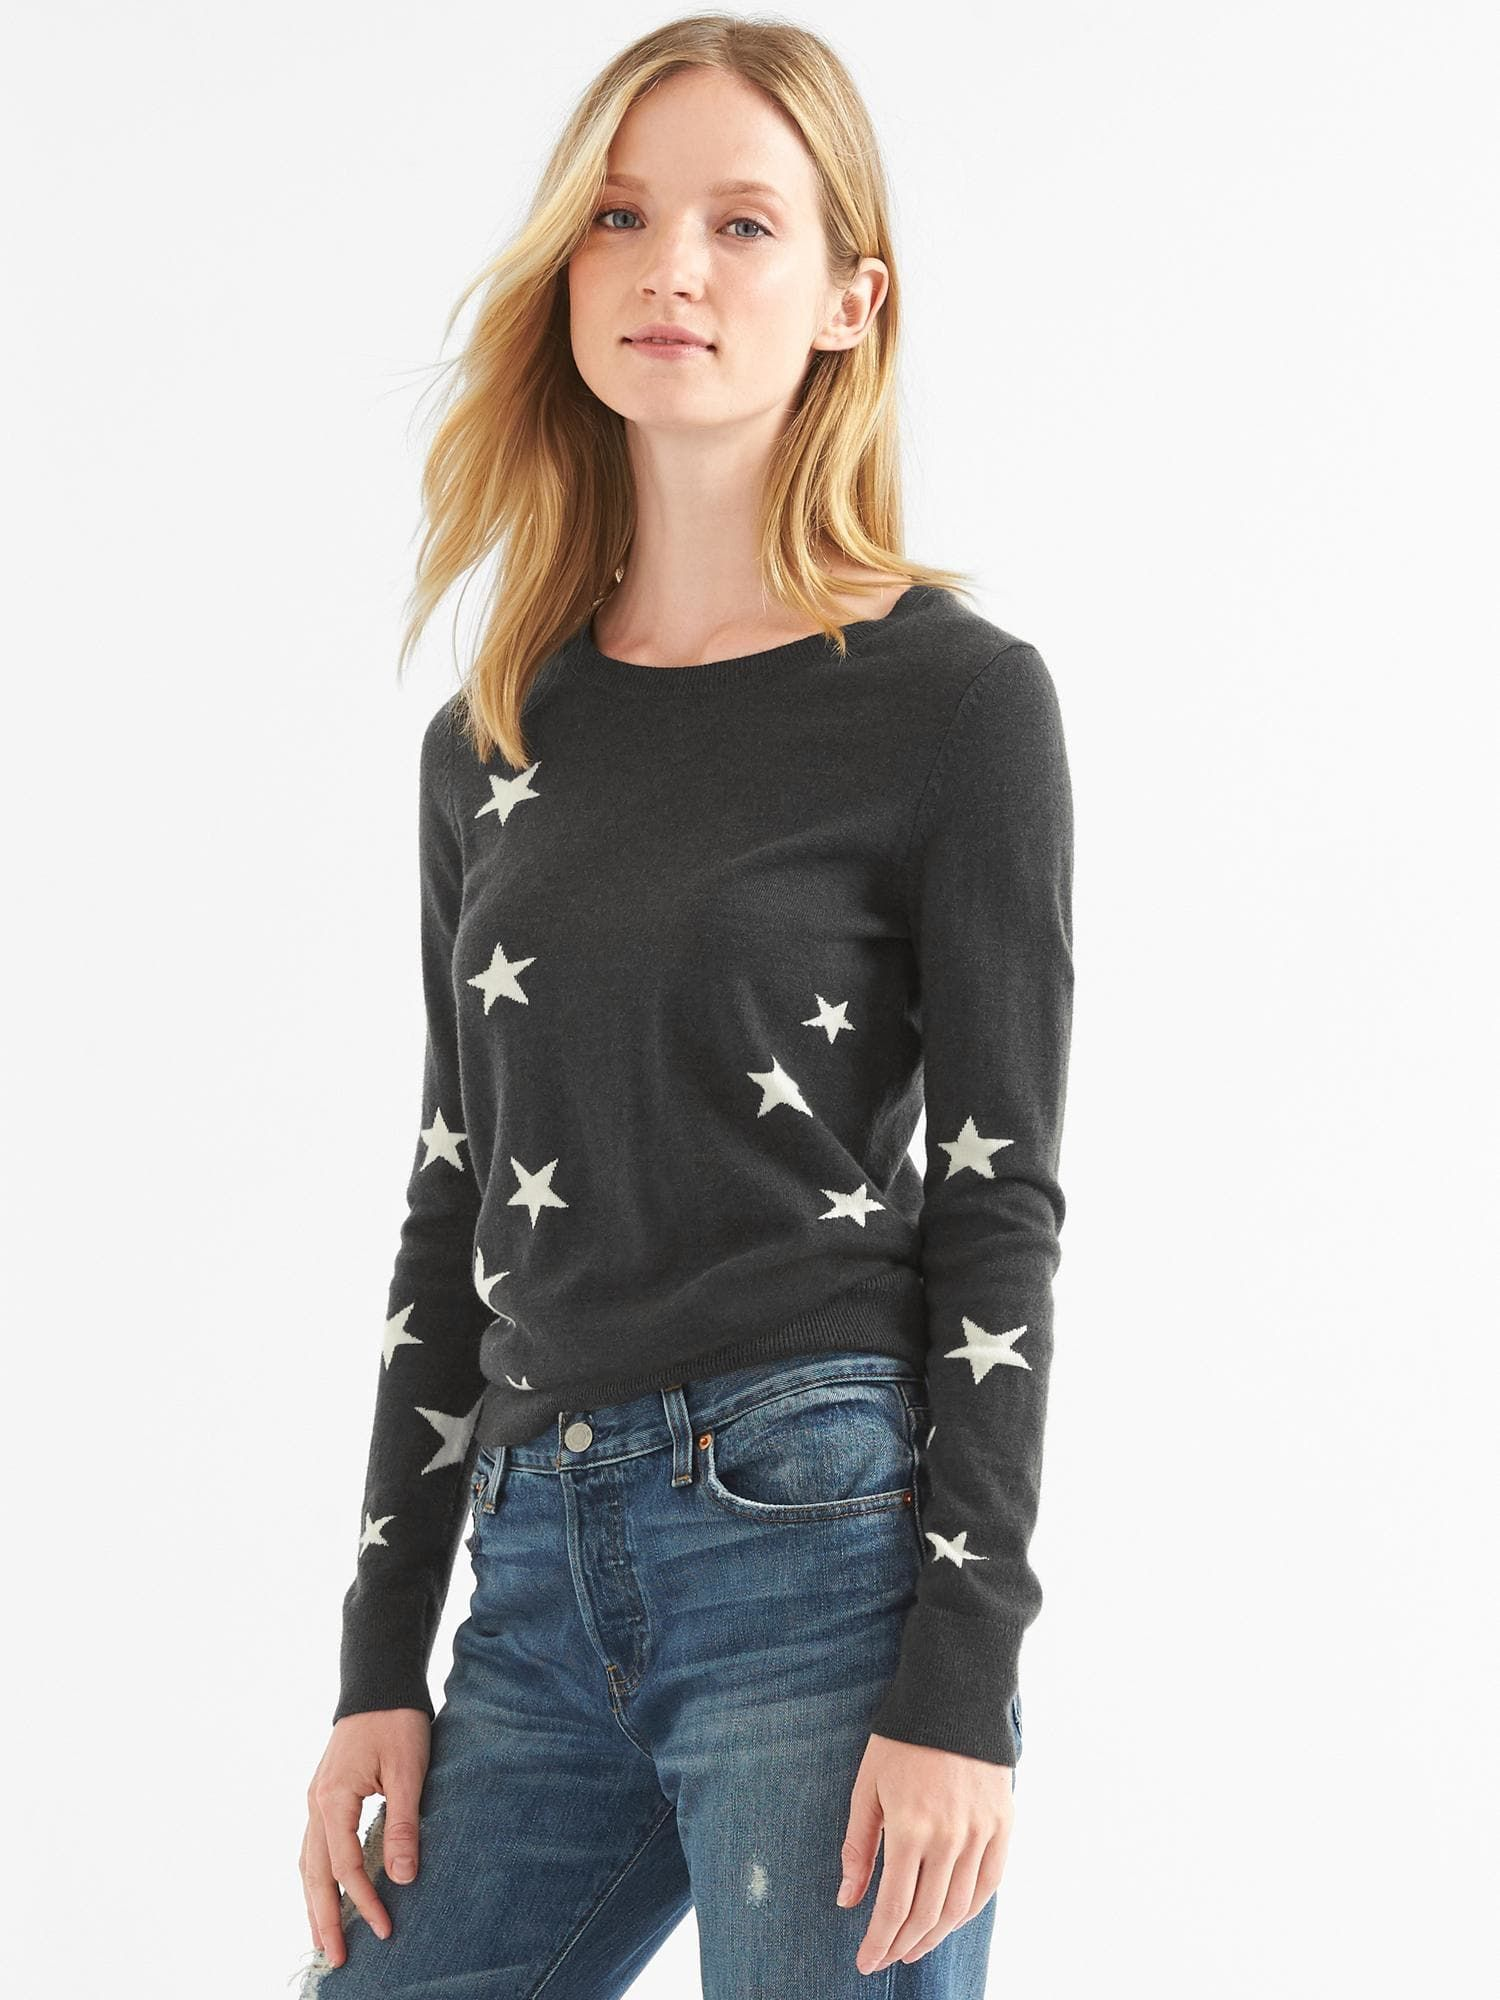 8325a70478d Merino star crewneck sweater